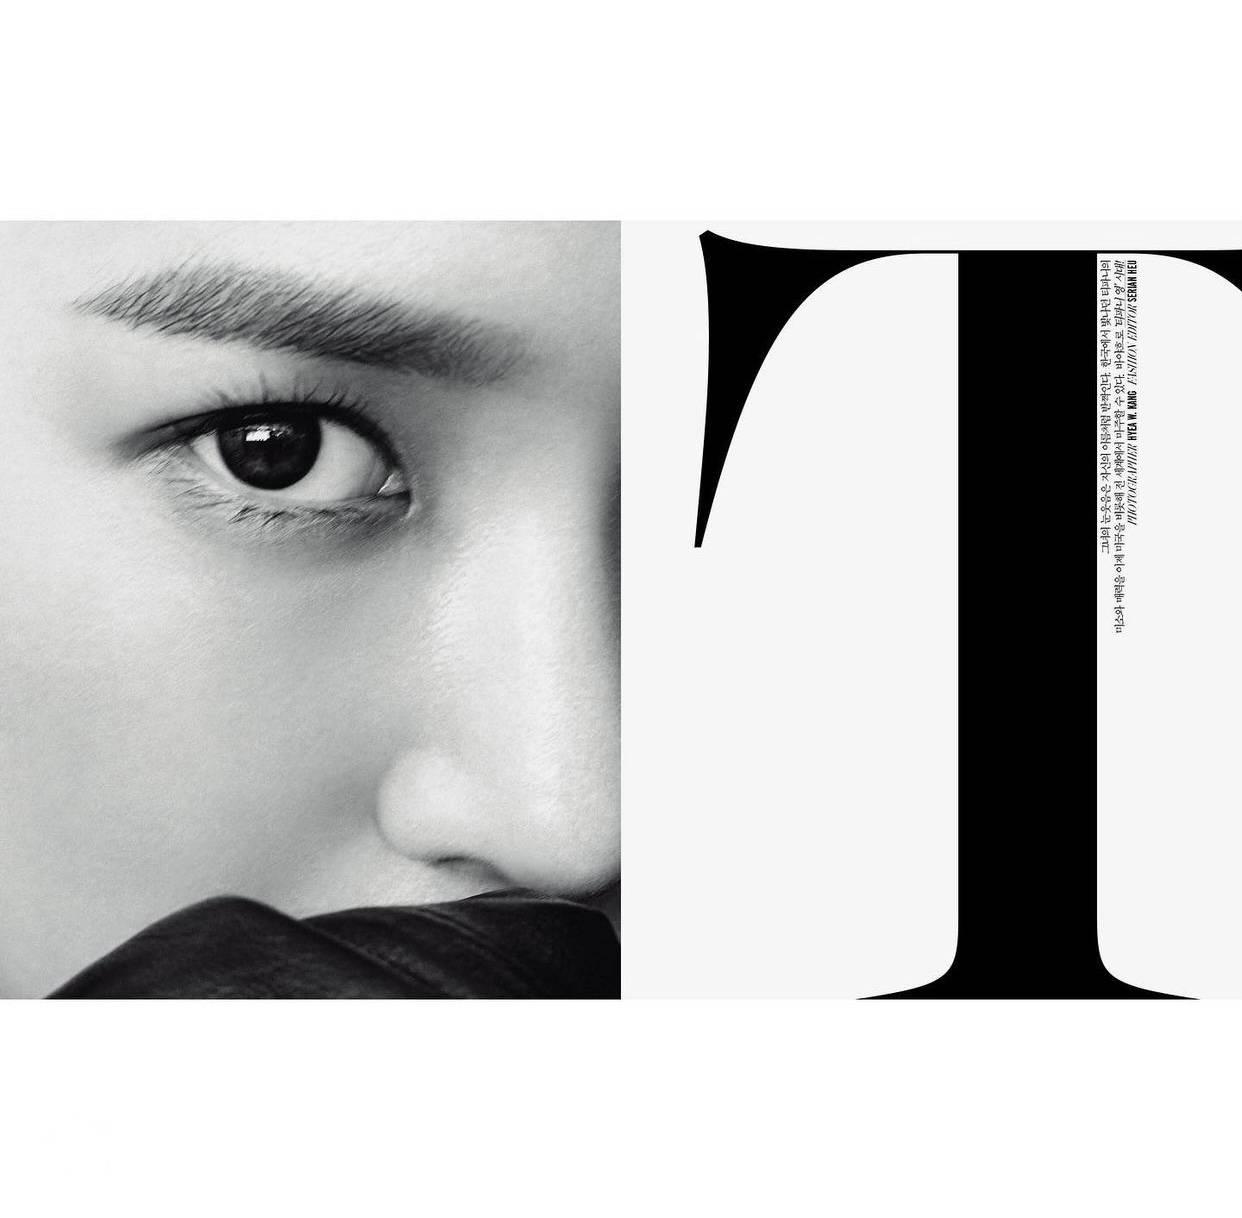 Haute Couture, Lingerie Typeface, fashion fonts, fashion typography, vogue fonts, must have fonts for fashion, best fonts 2021, must have fonts 2021, Fashion logos, vogue fonts, fashion magazine fonts, sexy logos, sexy fashion logo, fashion ligatures, Vogue Korea